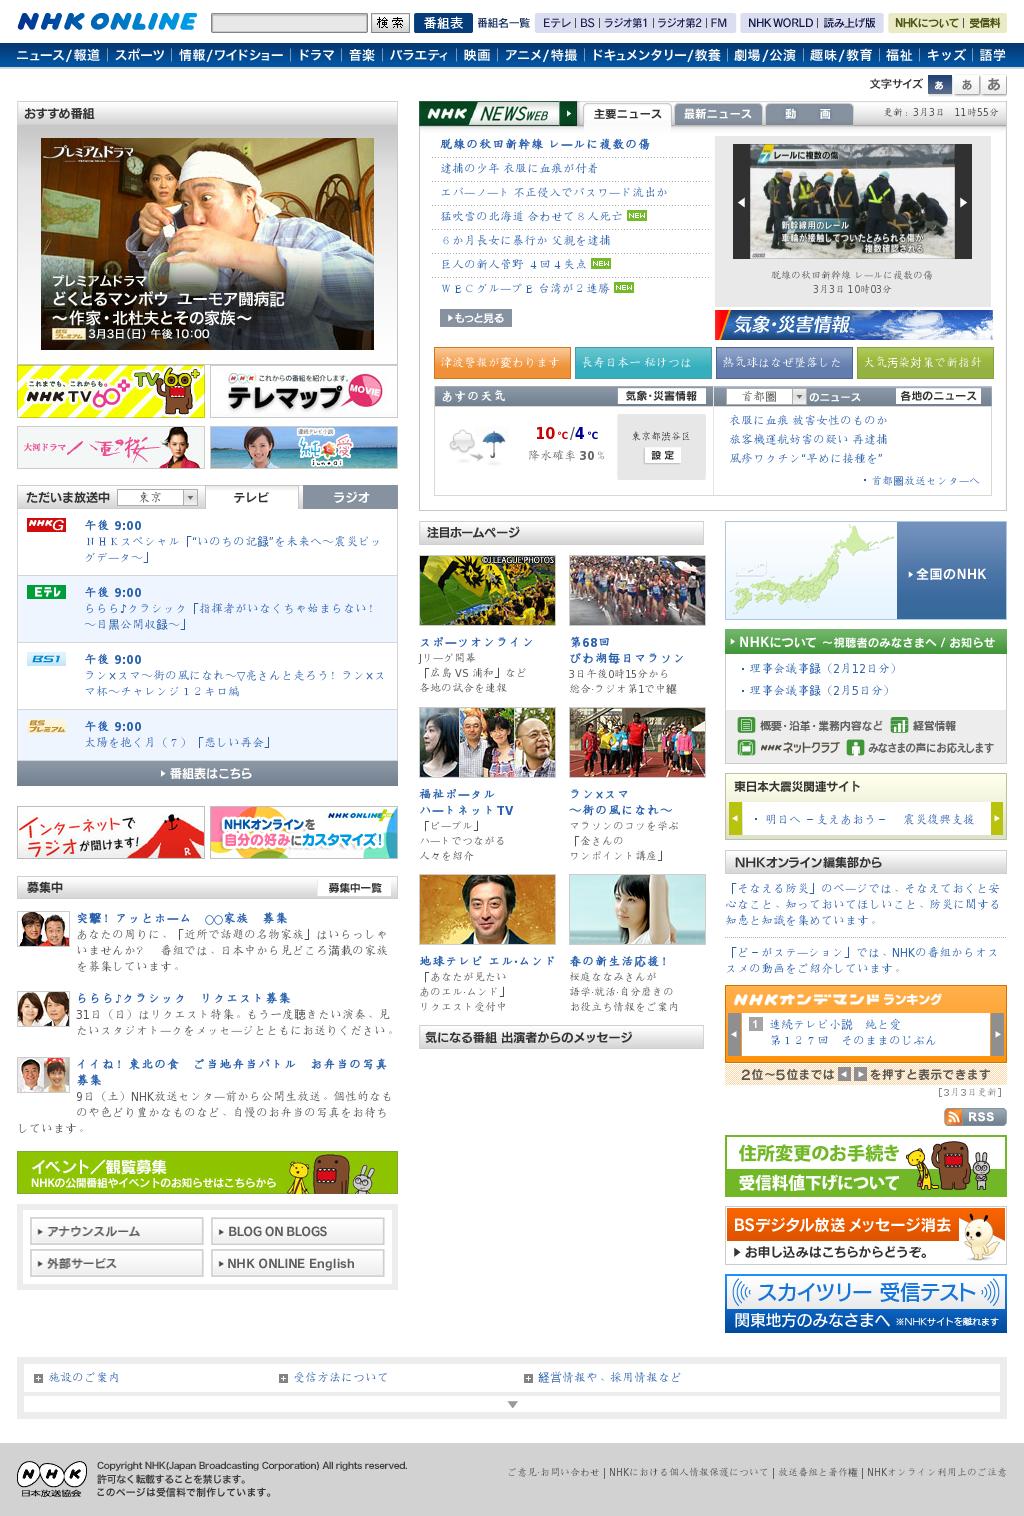 NHK Online at Sunday March 3, 2013, 12:14 p.m. UTC